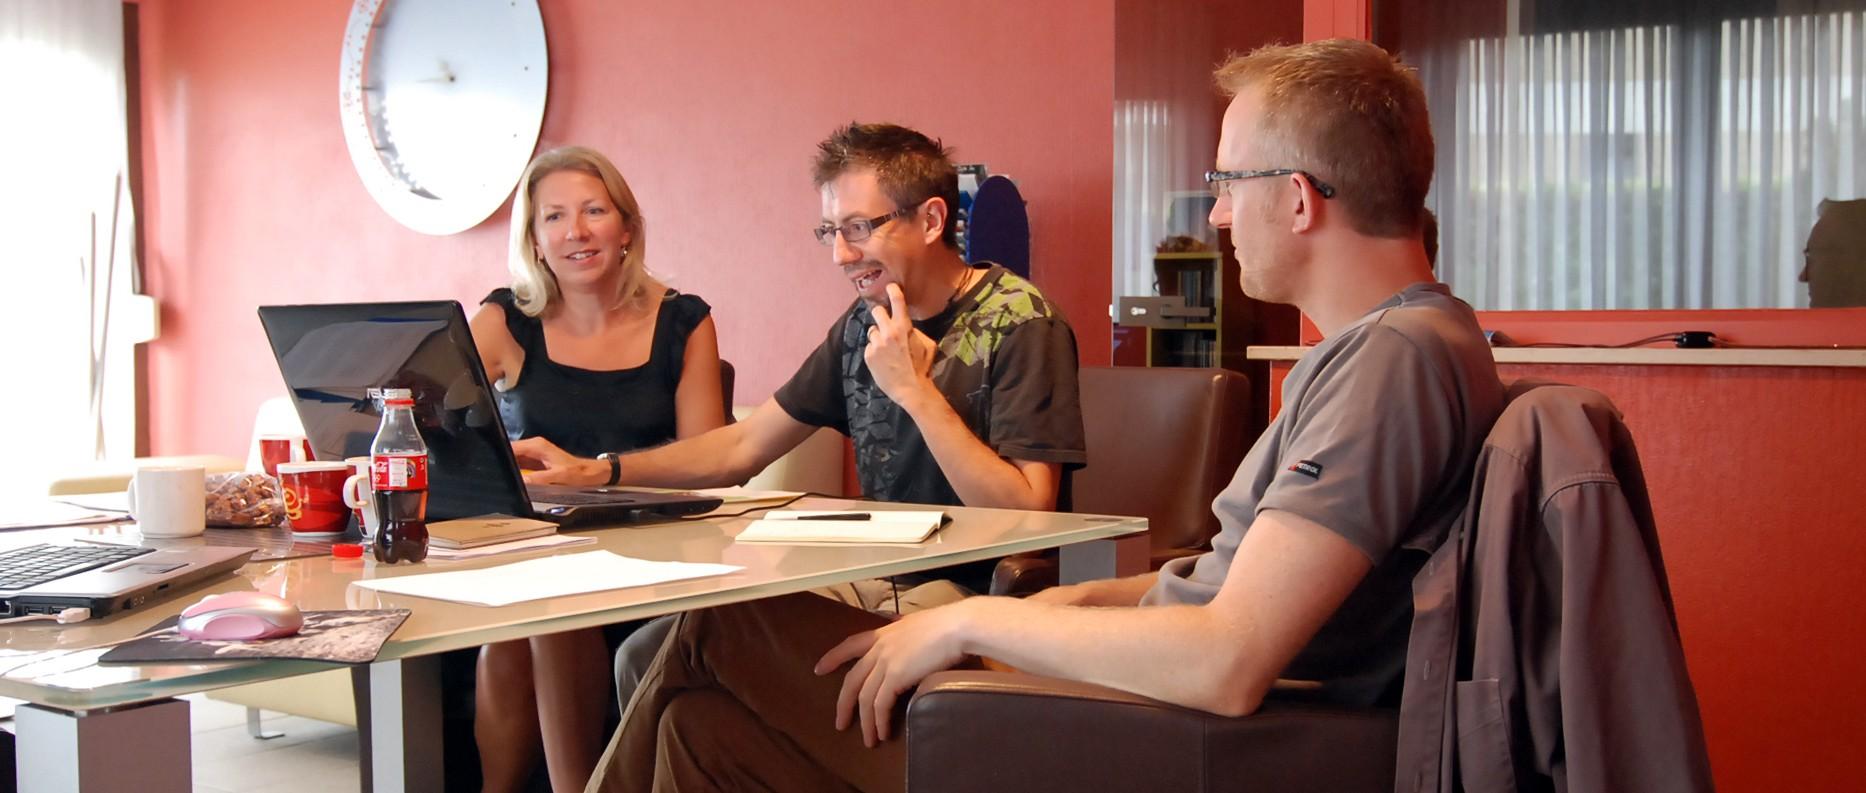 Brainstorming site G1000